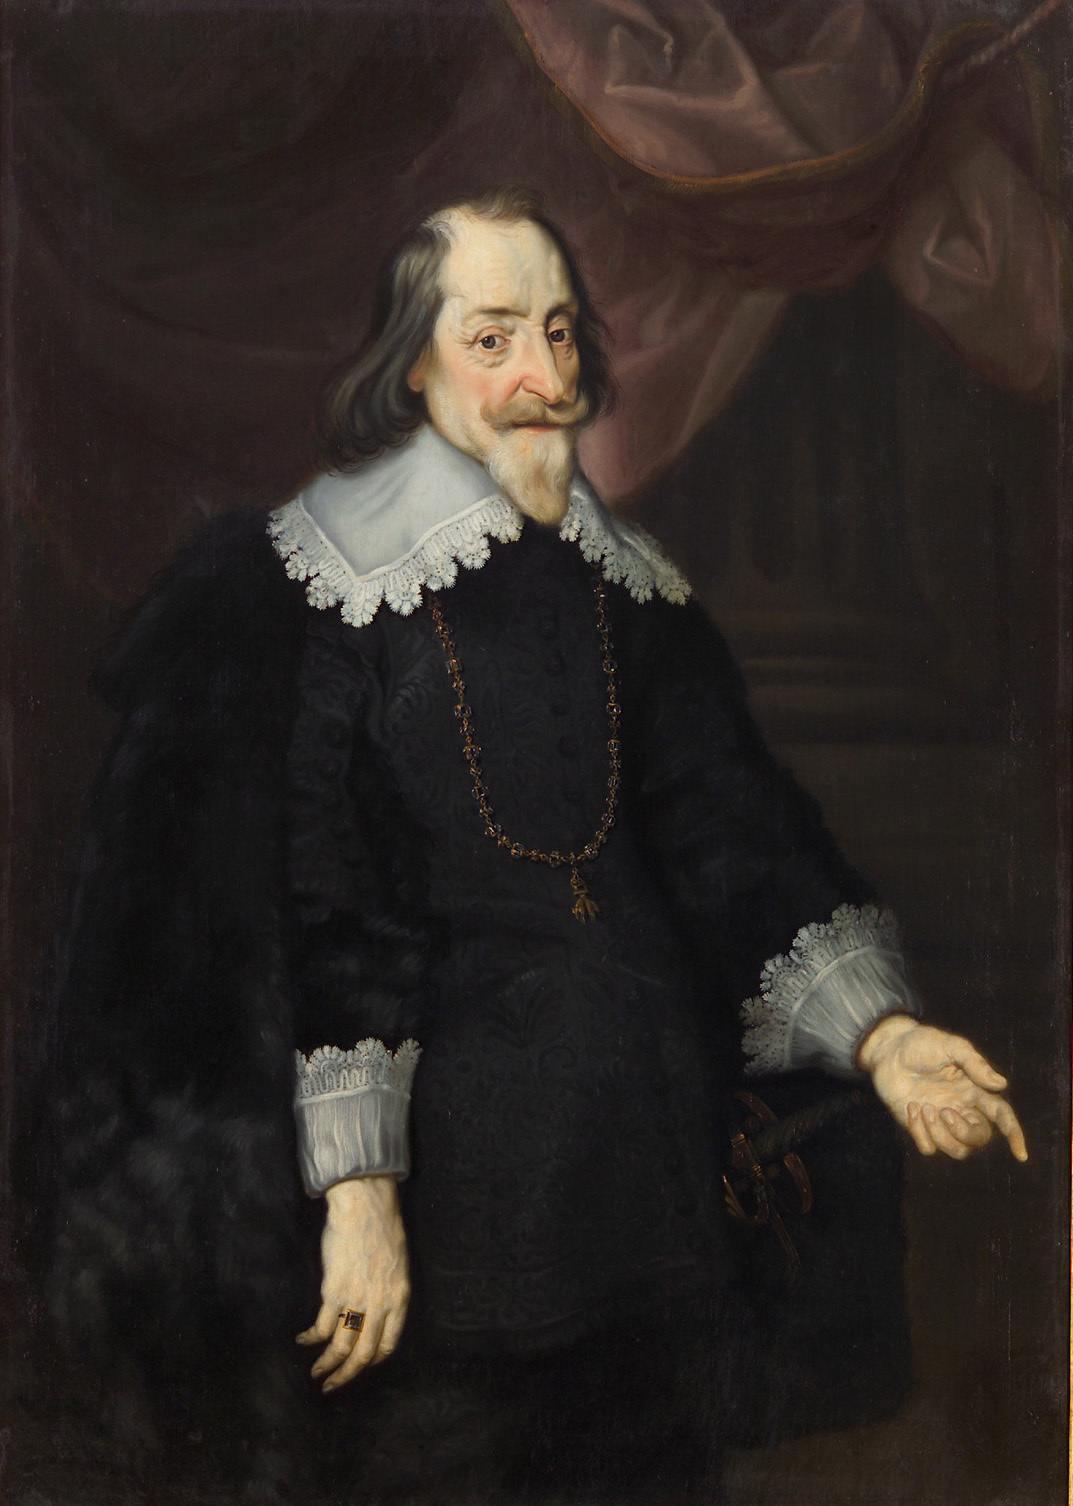 Maximilian I, Elector of Bavaria